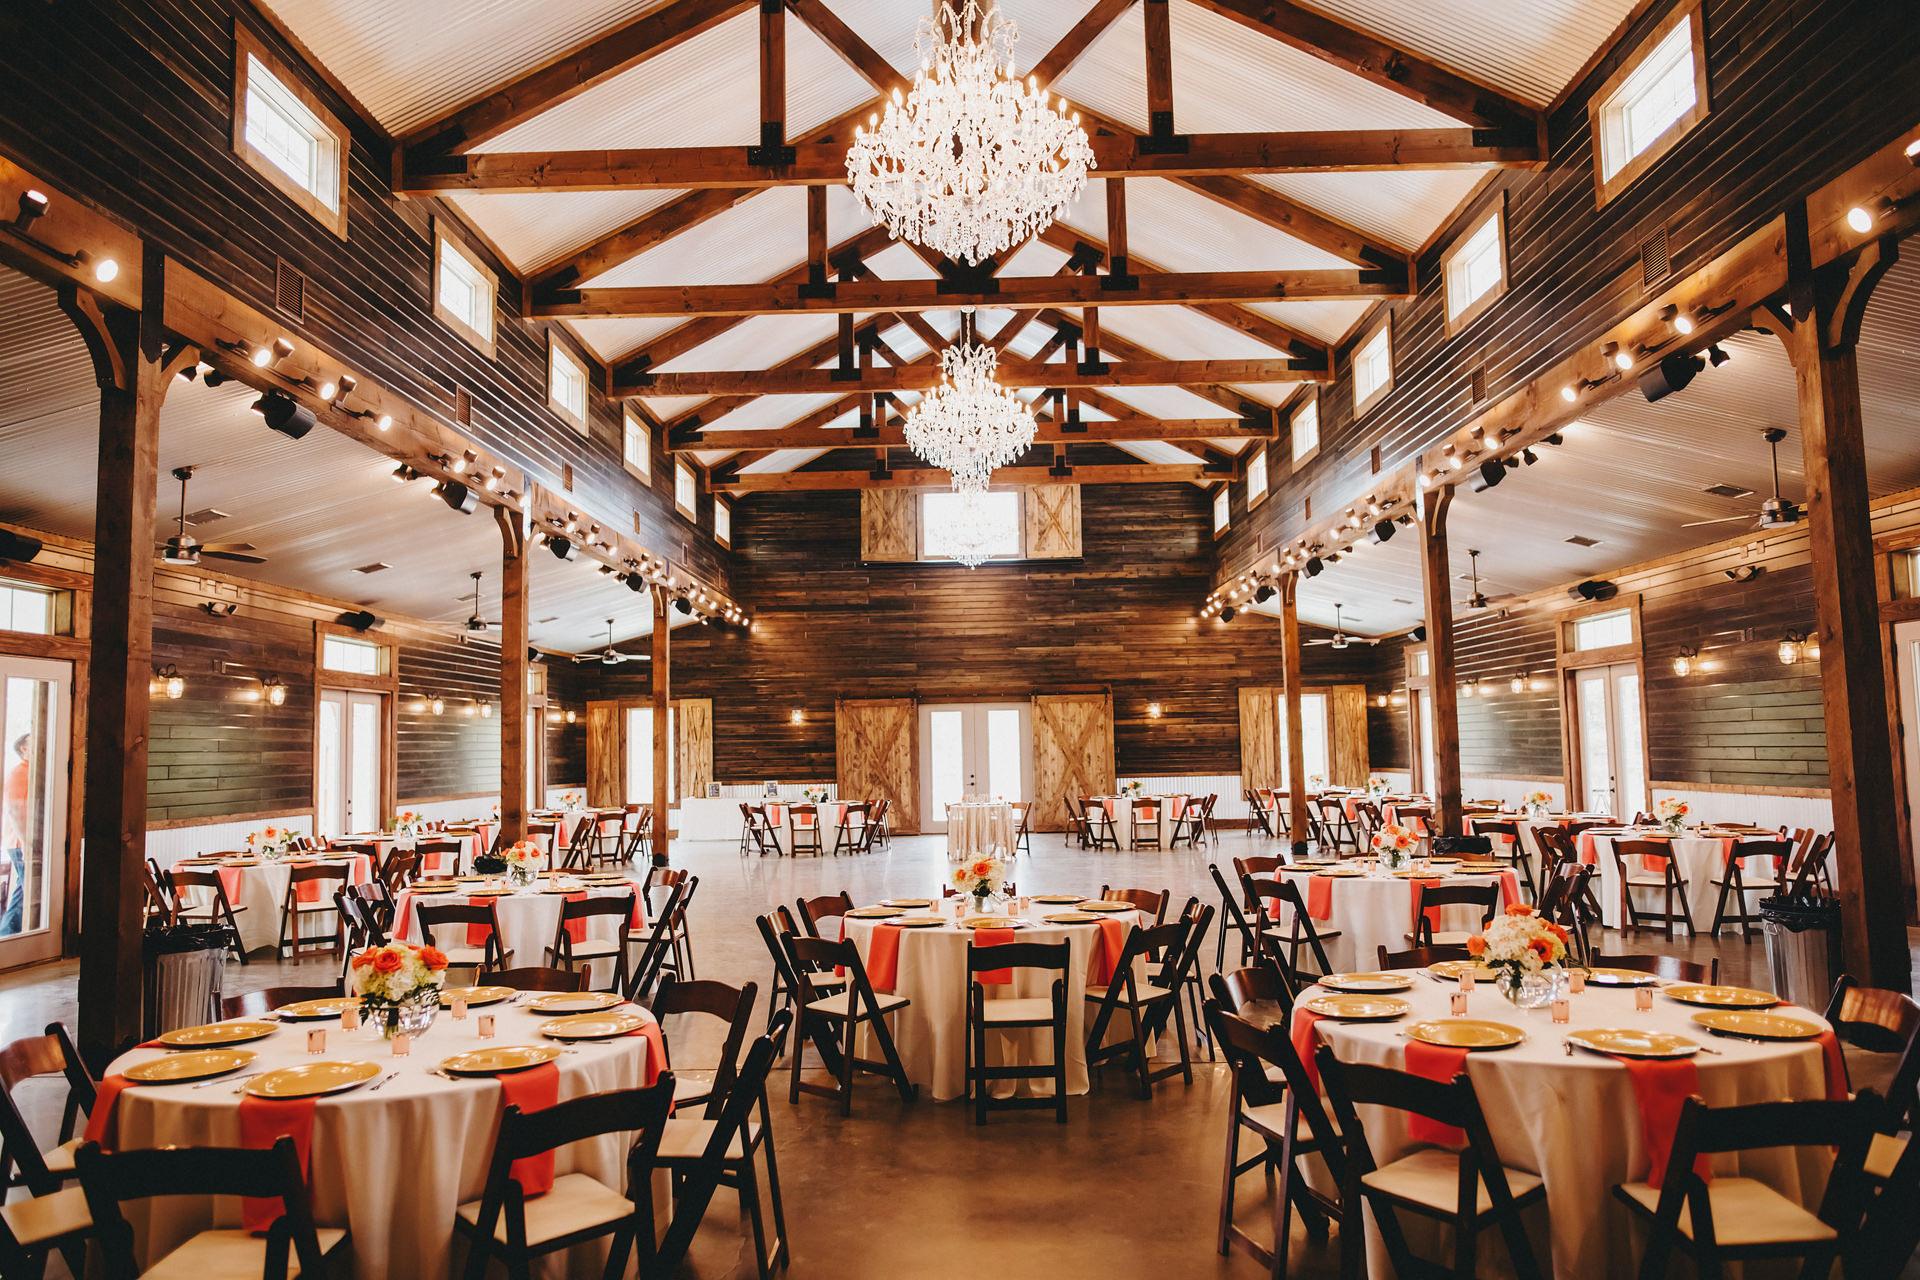 barn style wedding venue texas peach creek ranch